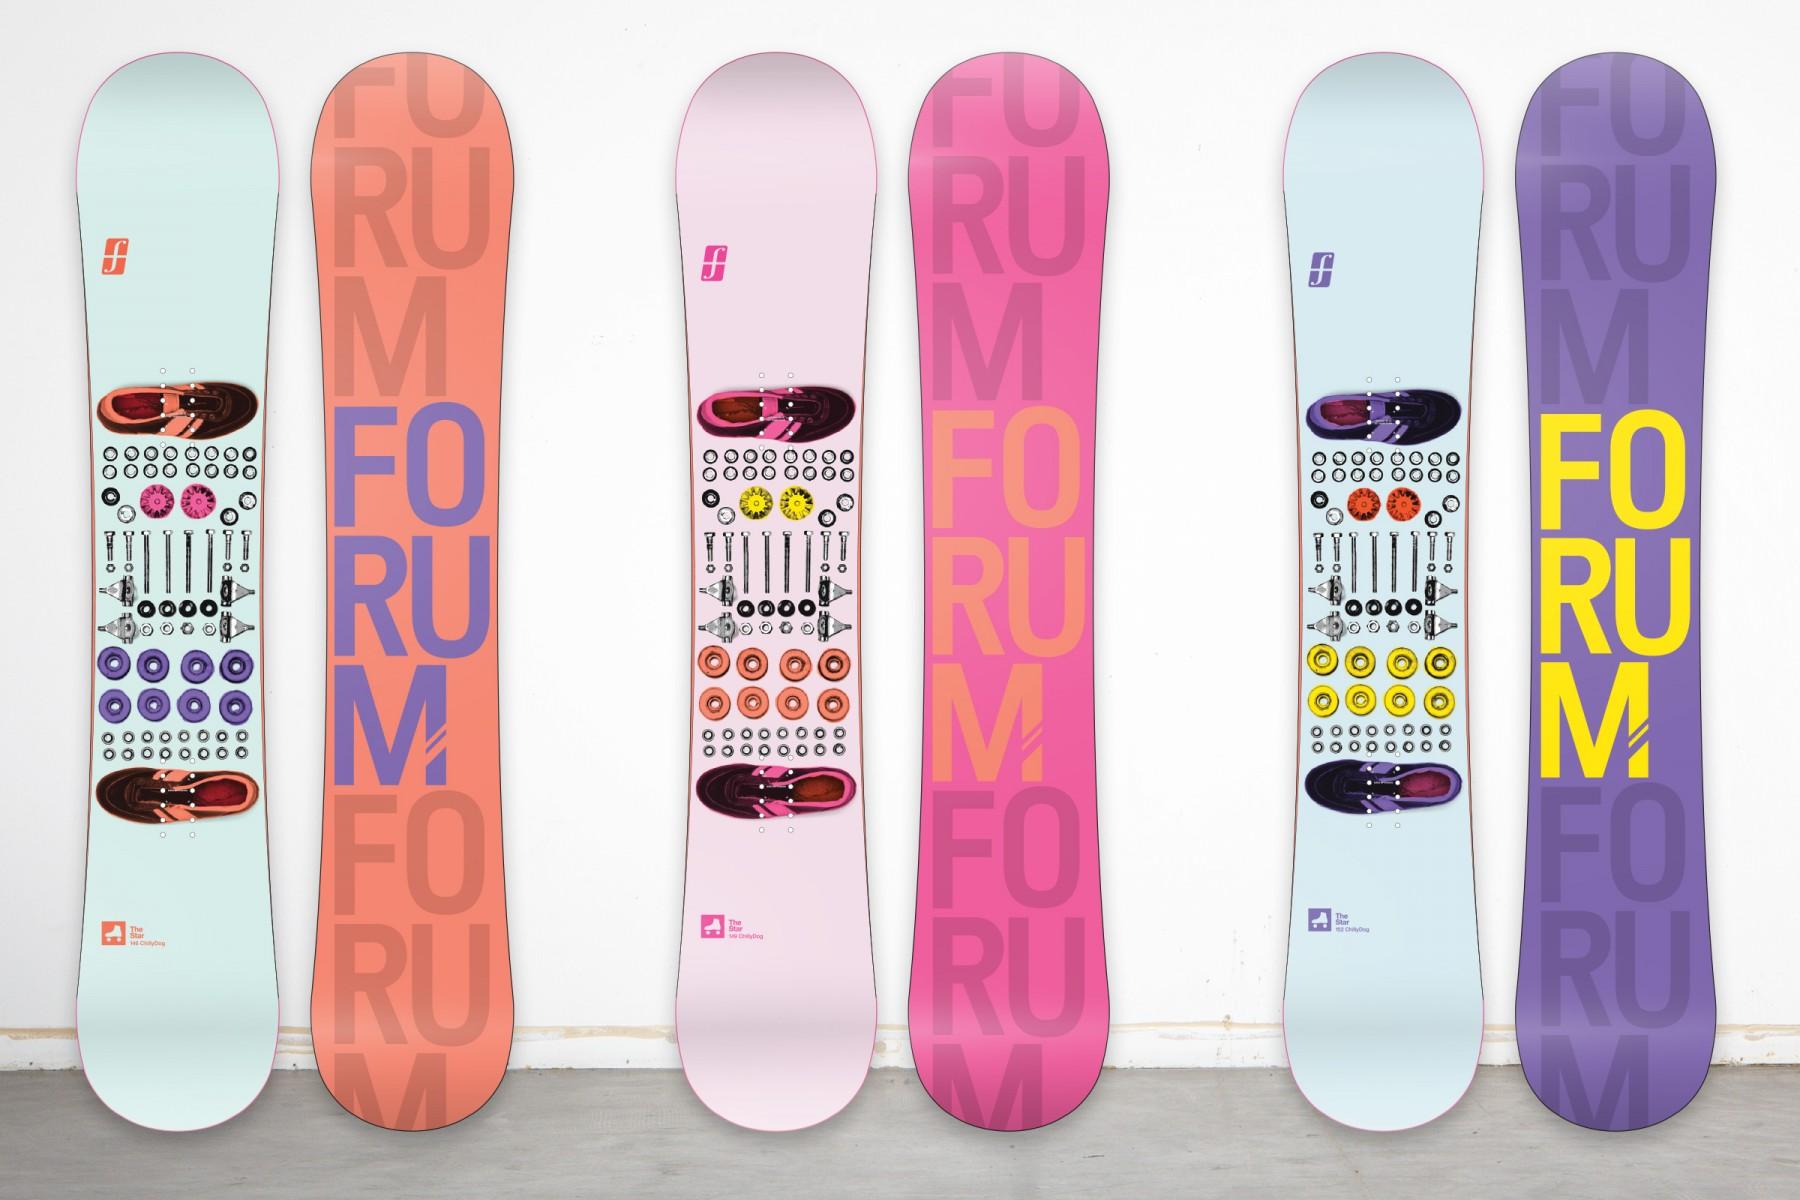 2013 Boards